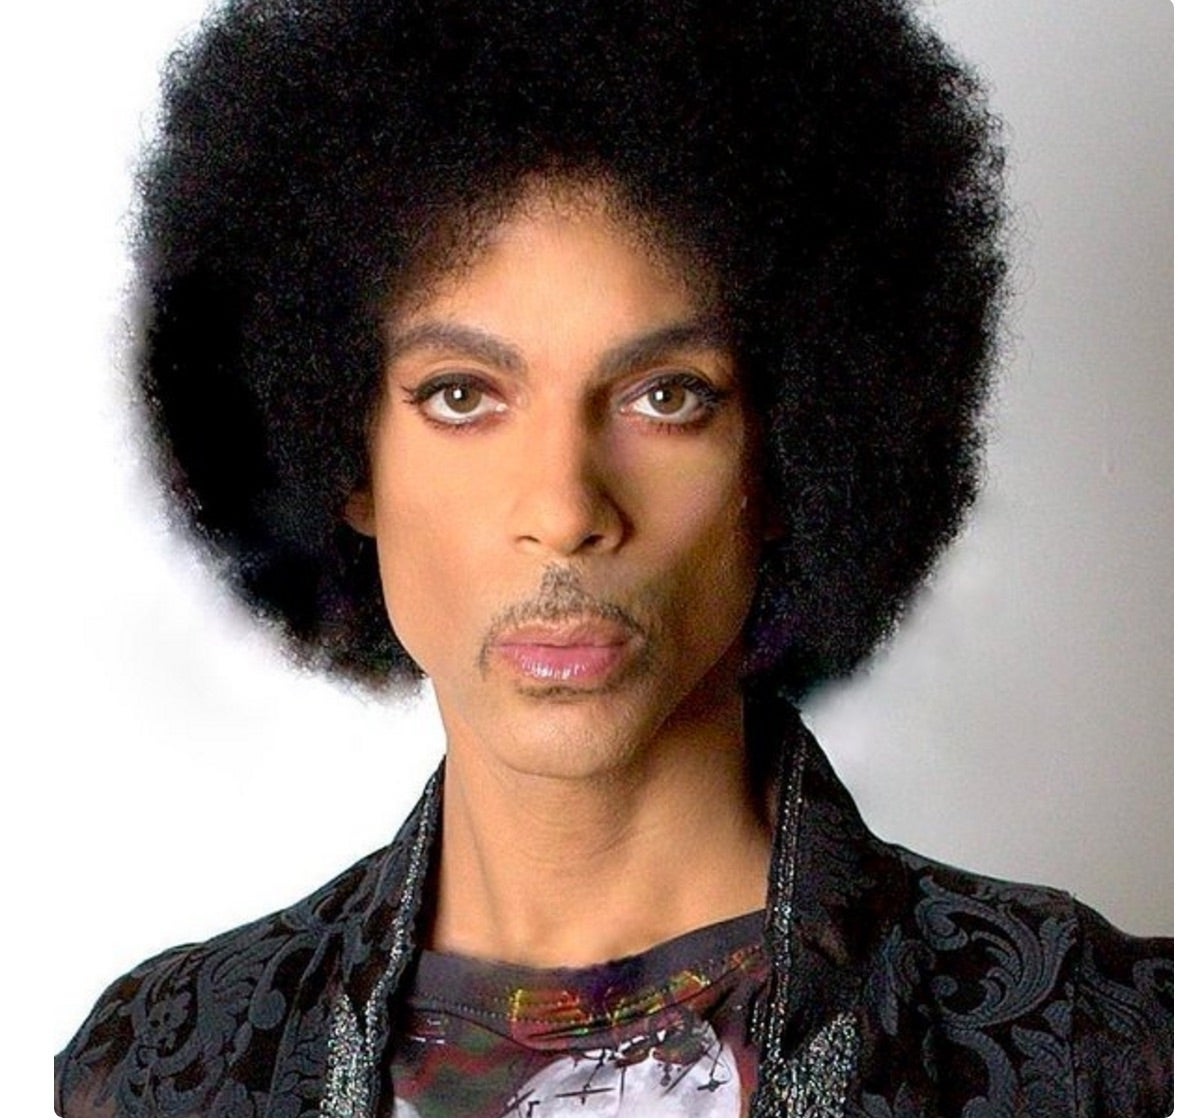 Like Many of Us, Prince Is a Steph Curry Fan